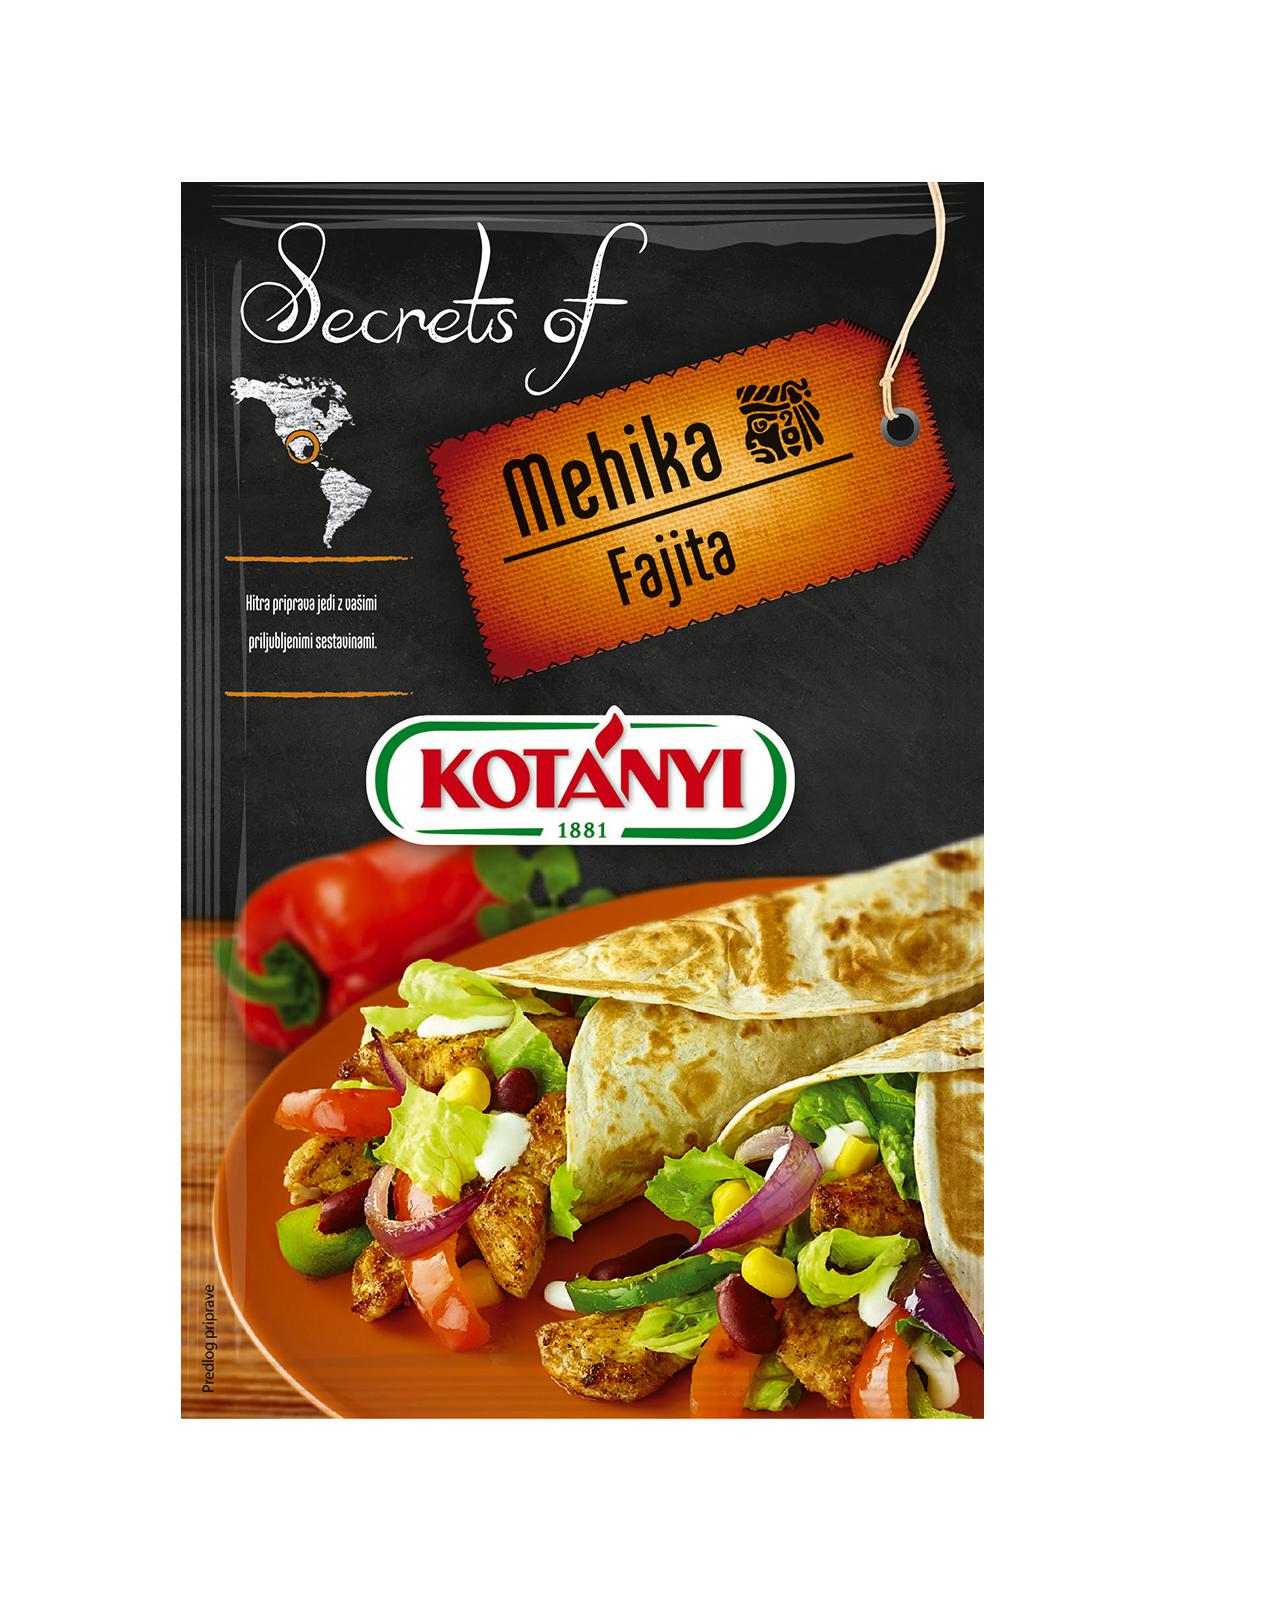 350106 Kotanyi Secrets Of Mehika Fajita B2c Pouch